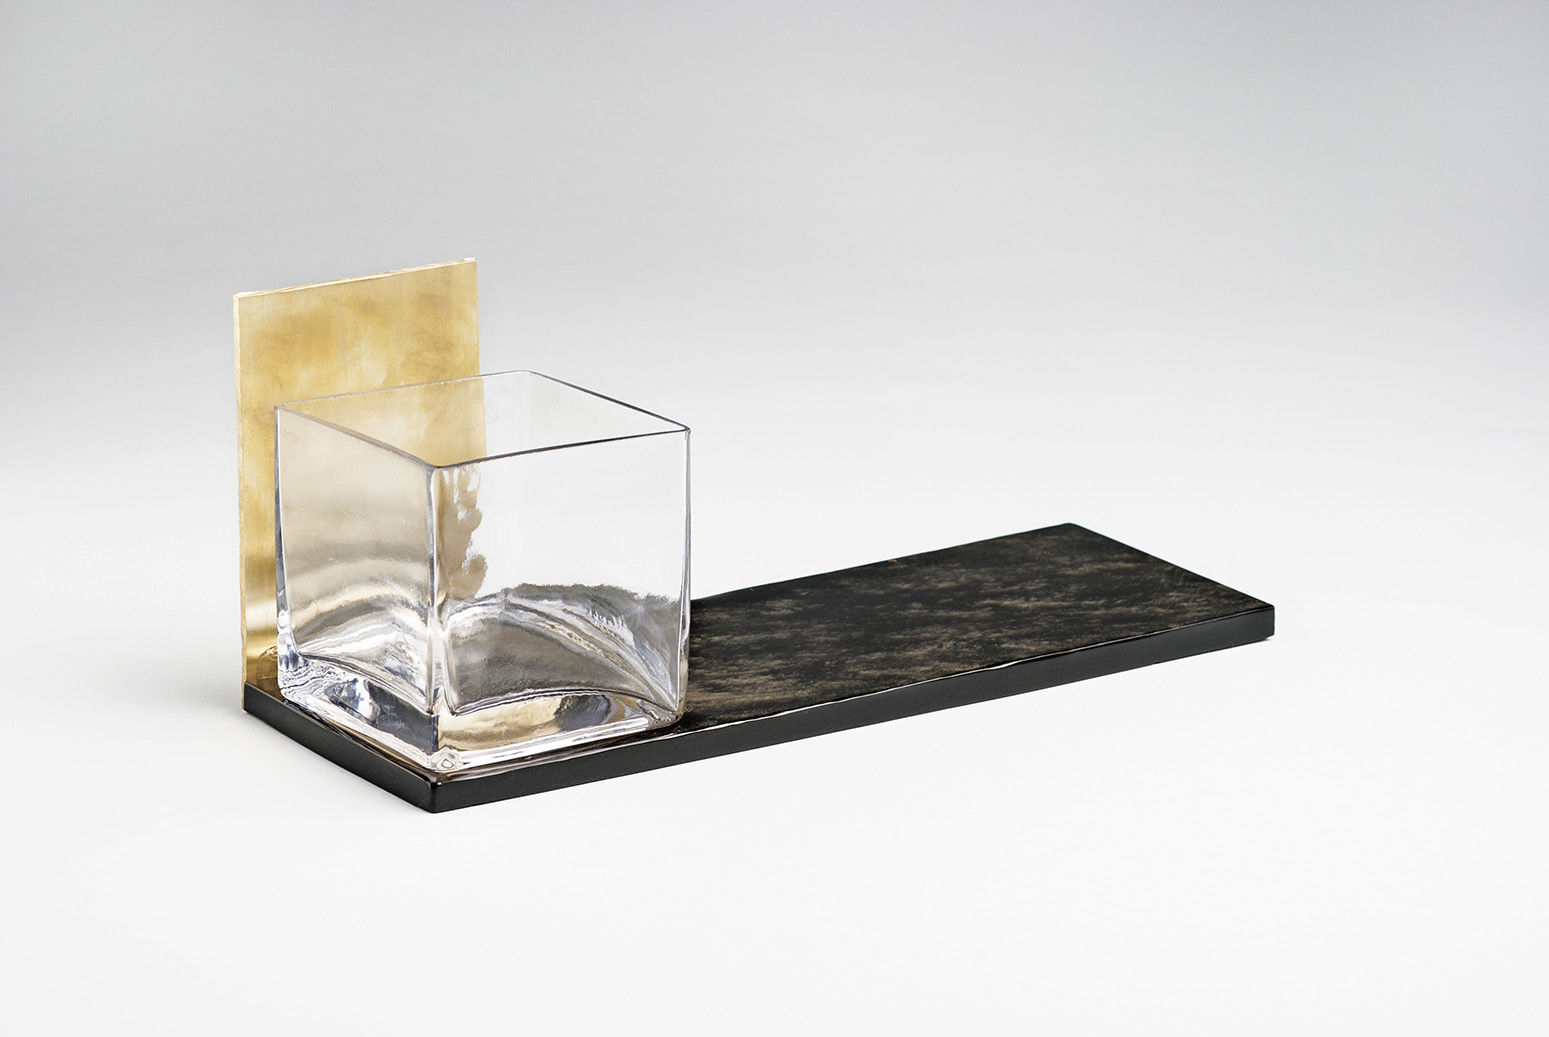 Obsidan-Glass-tablet-design-Ana-Karla-Contreras-artisan-Gregorio-Trejo-Cruz-Anahuac-MarionFriedmann-MexicoDesignTime1.jpg